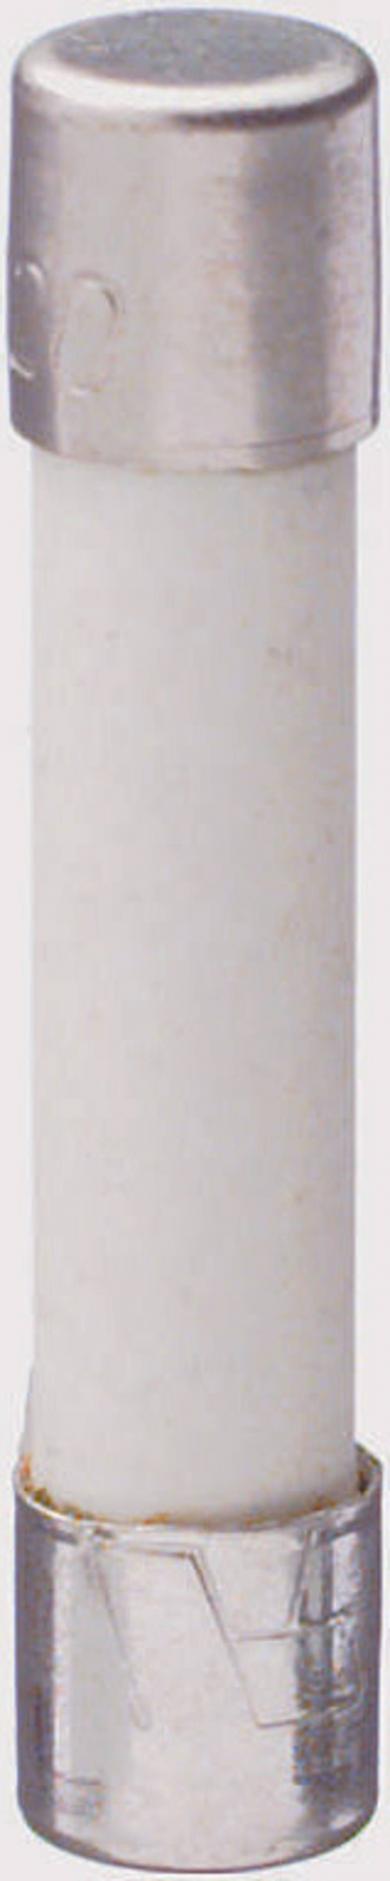 Siguranţă 6,4 x 31,8 mm ultrarapidă -FF- Eska tip GBB, 250 V/AC, 125 V/DC, 8 A